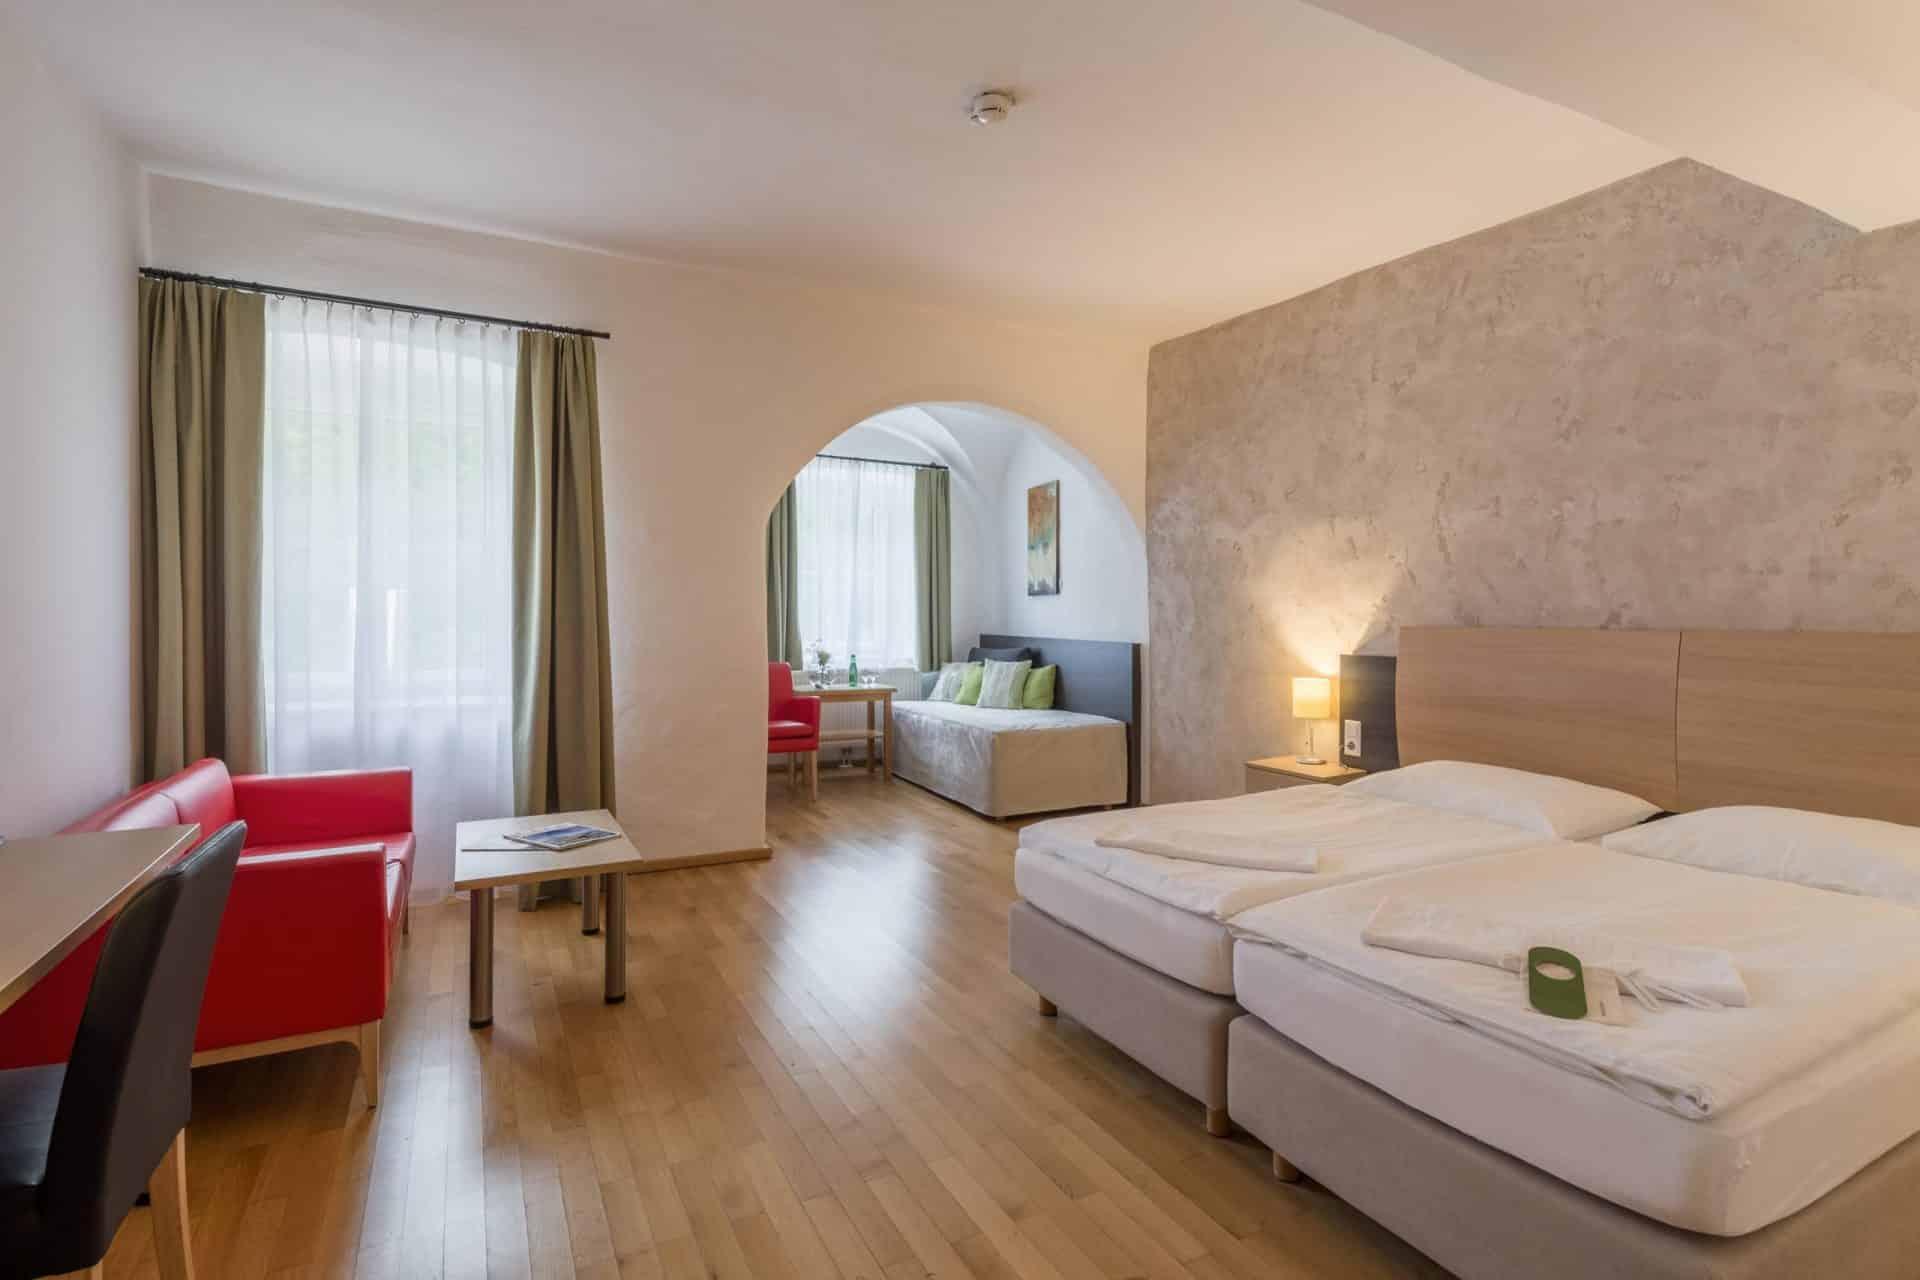 Wesenufer Hotel & Seminarkultur an der Donau Zimmer ©Mark Sengstbratl